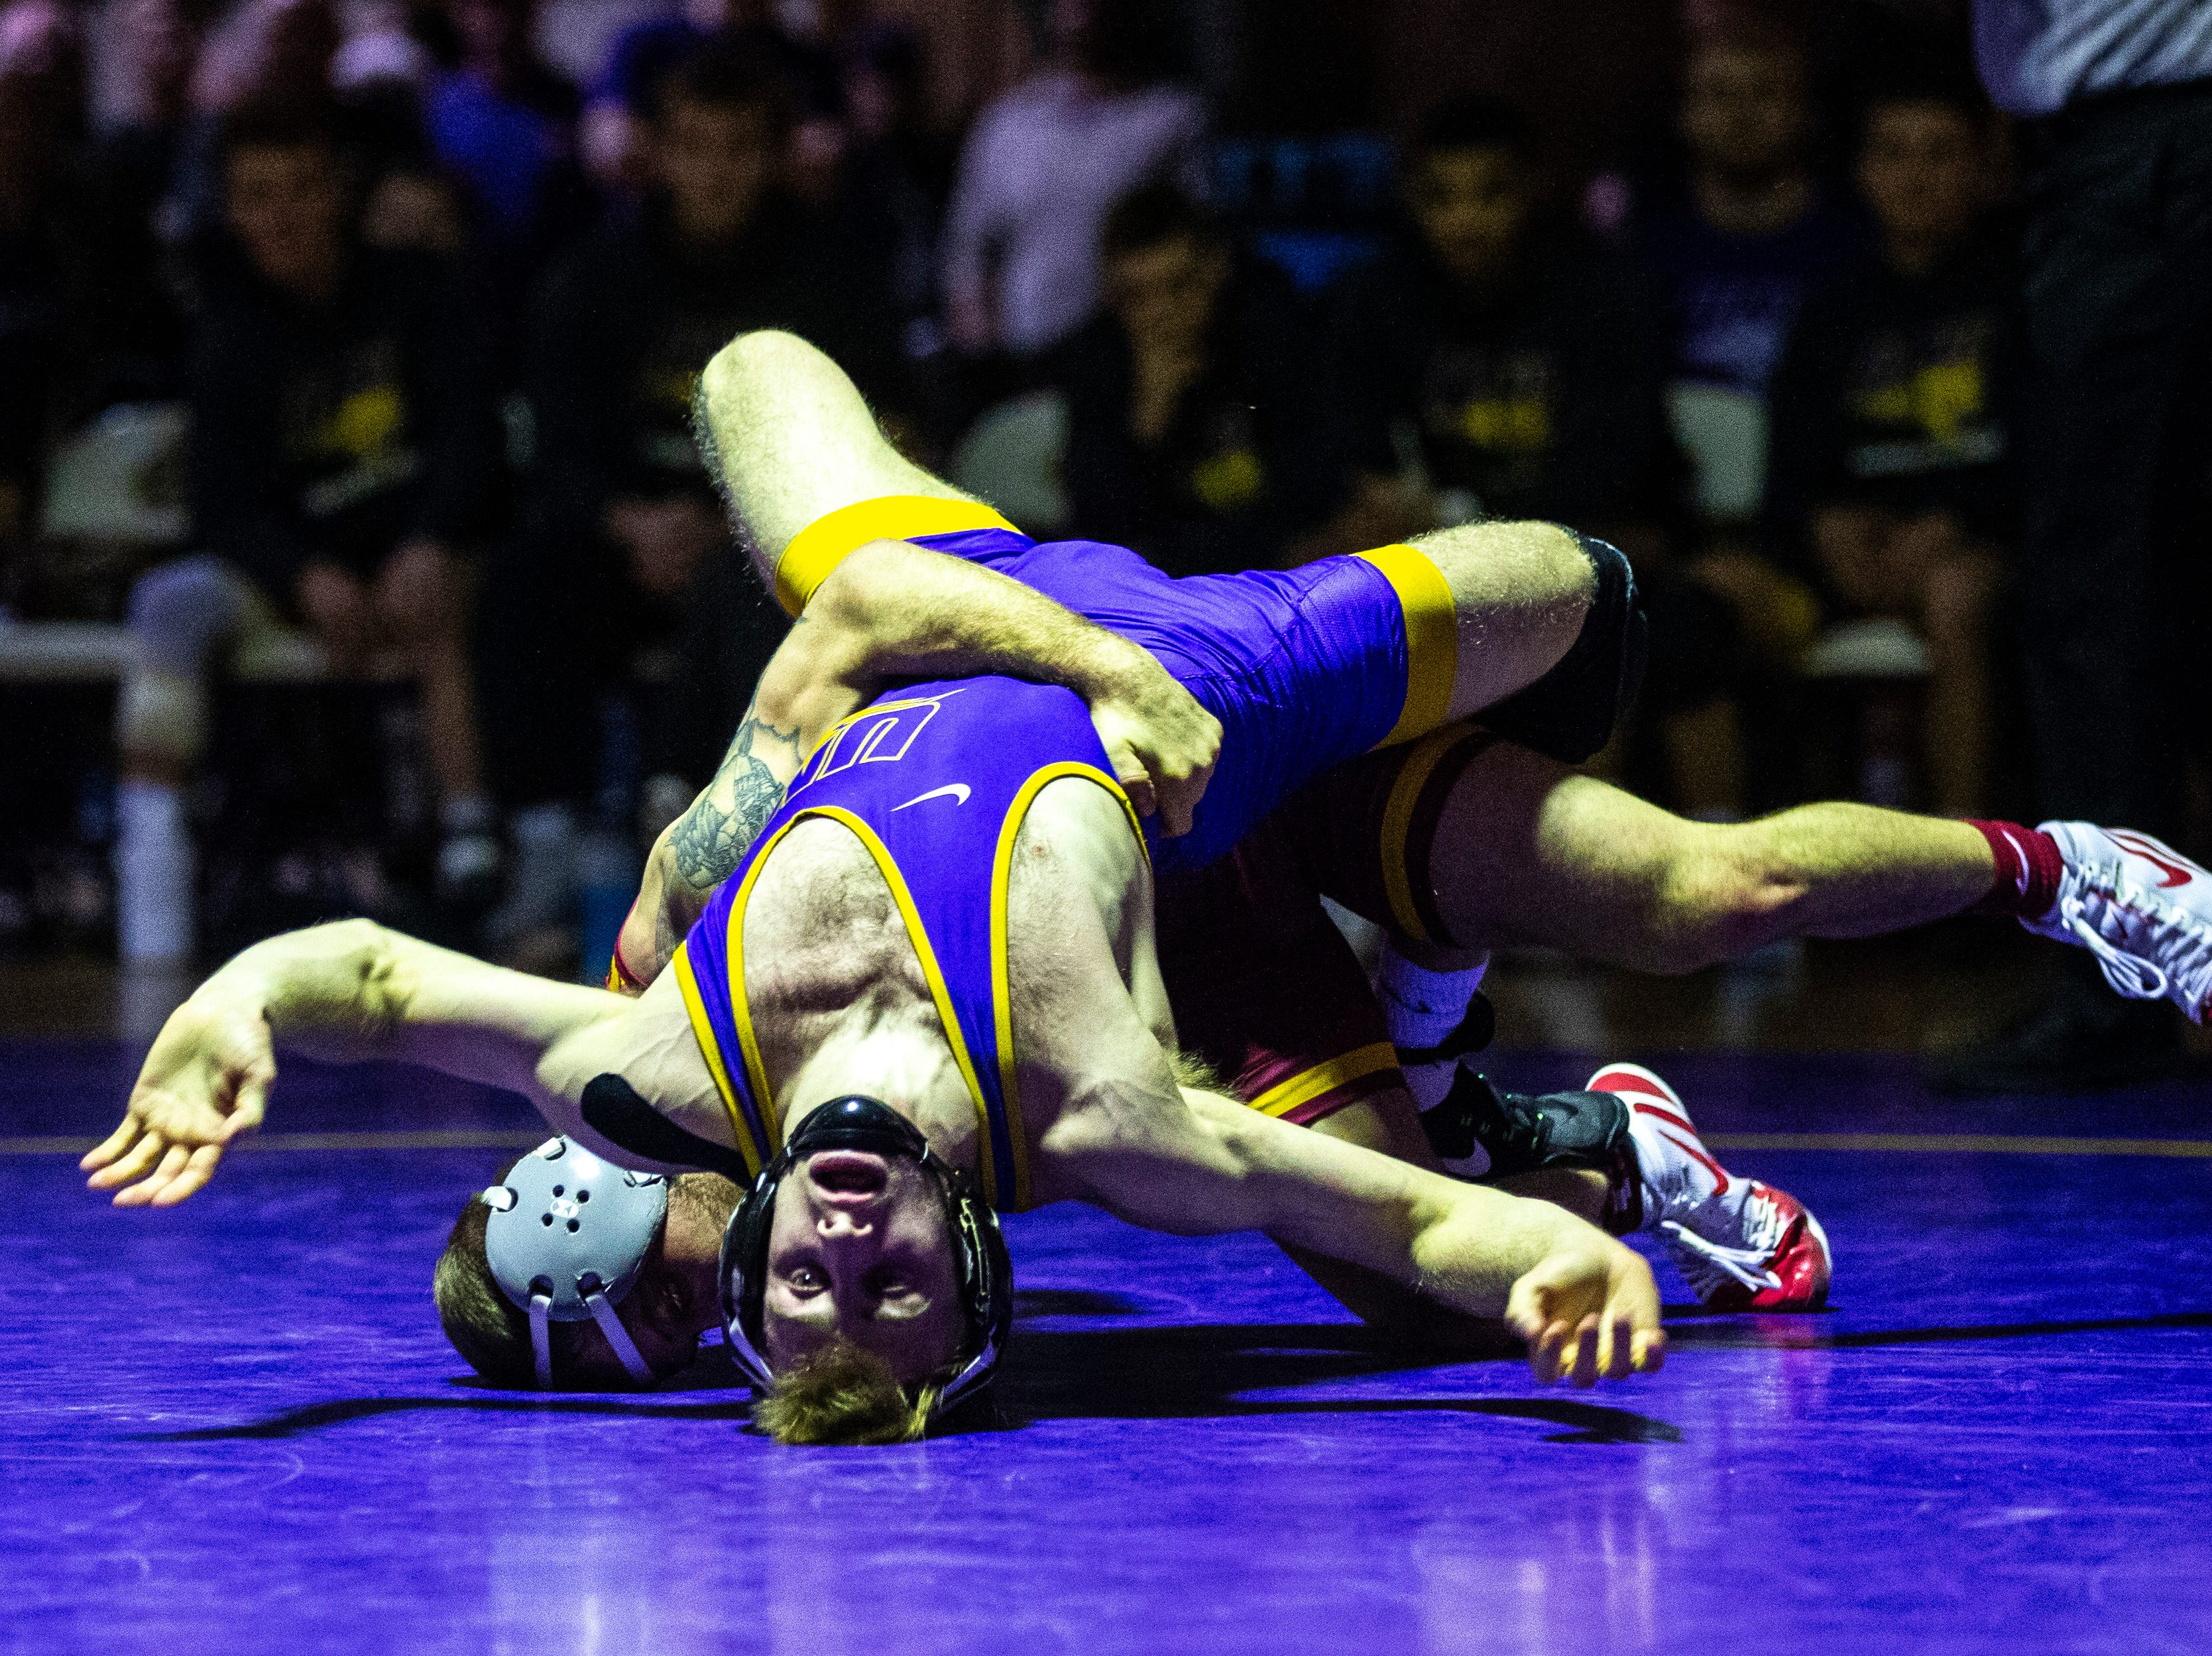 Northern Iowa's Jay Schwarm wrestles Iowa State's Alex Mackall at 125 during a NCAA Big 12 wrestling dual on Thursday, Feb. 21, 2019 at the West Gymnasium in Cedar Falls, Iowa.